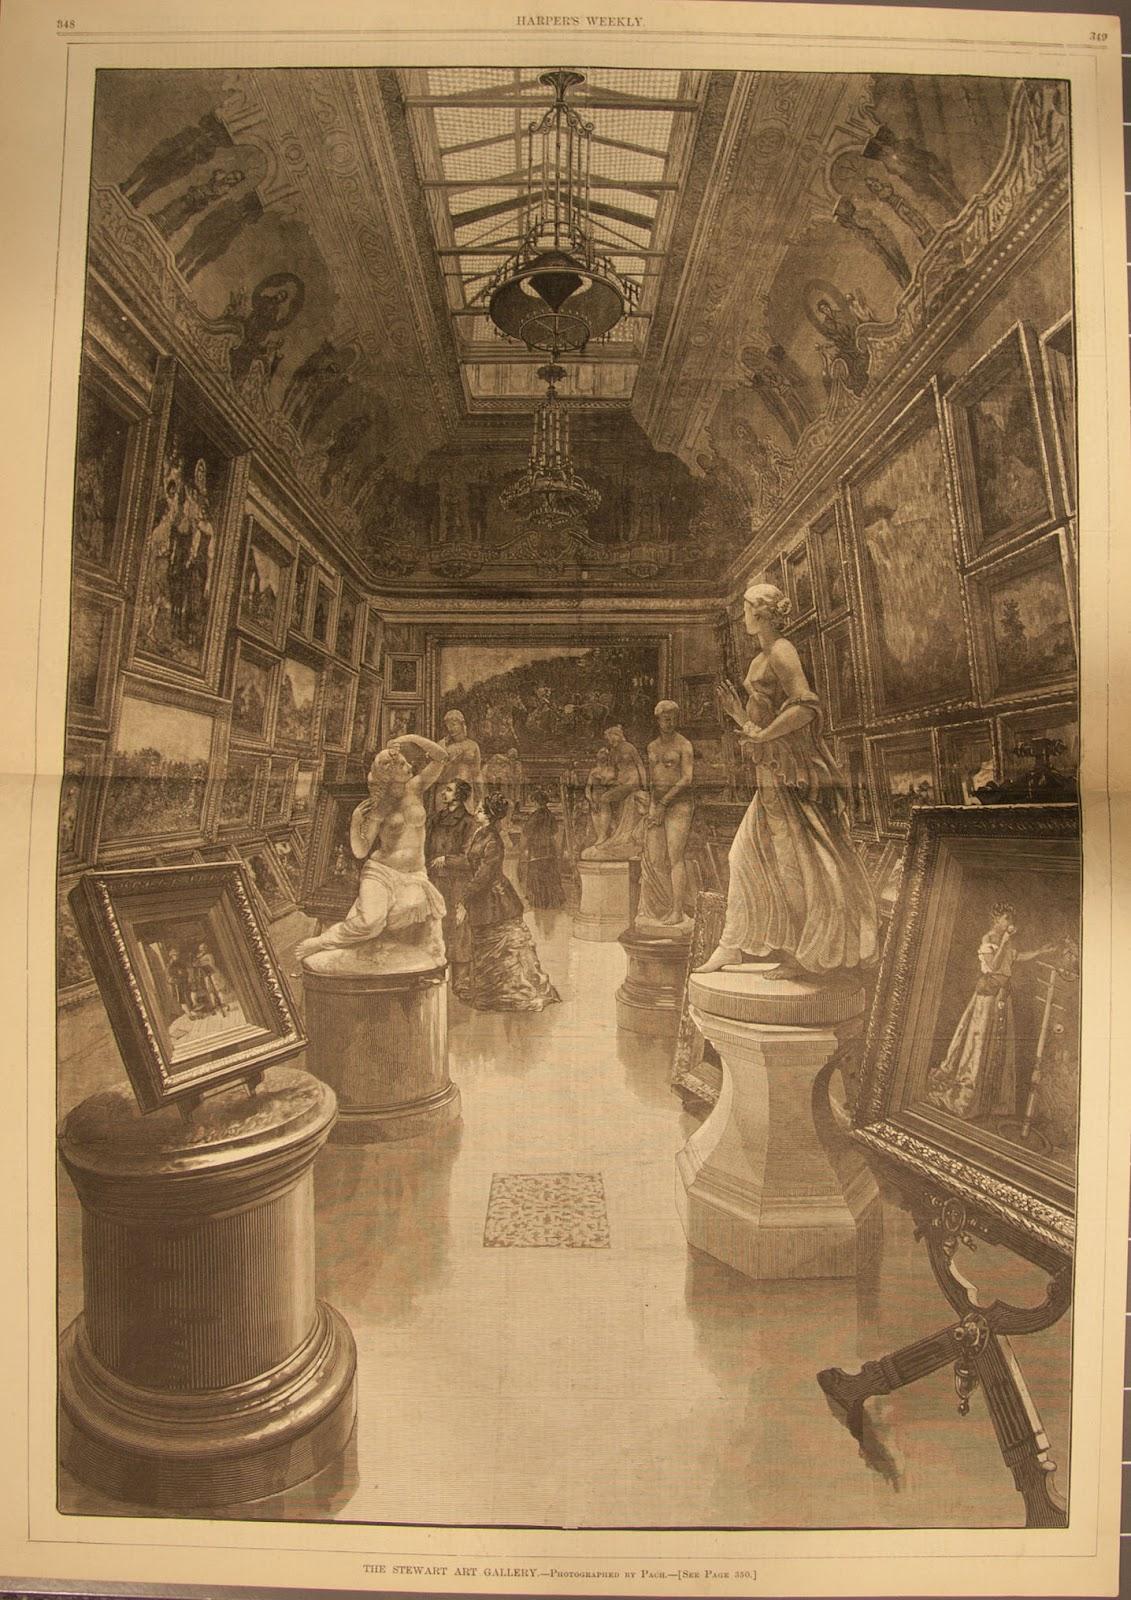 The Gilded Age Era: William C. Whitney Mansion New York City